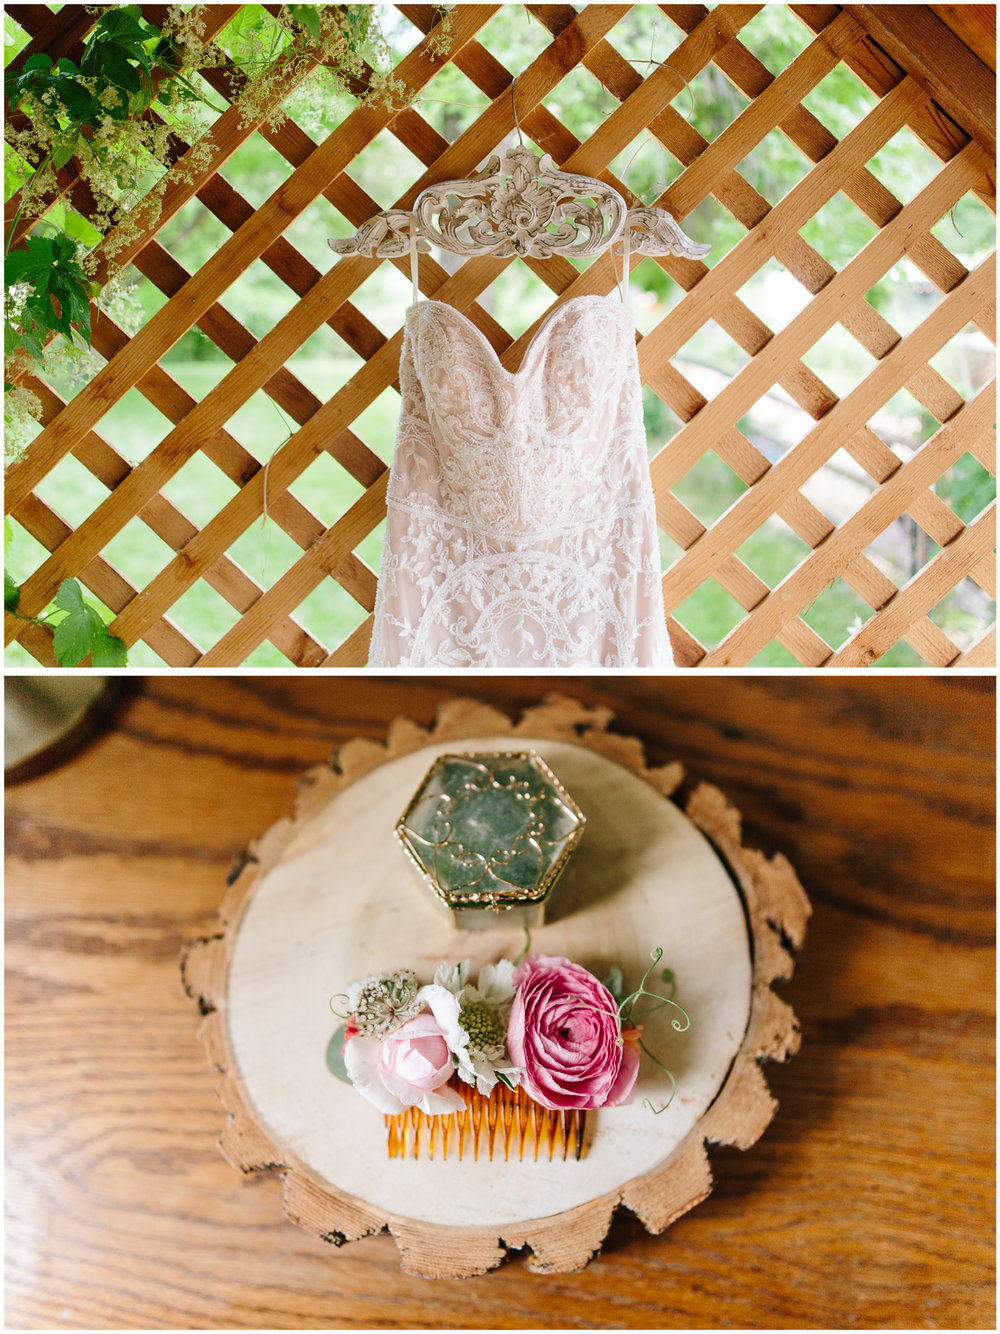 lyons_farmette_wedding_1.jpg